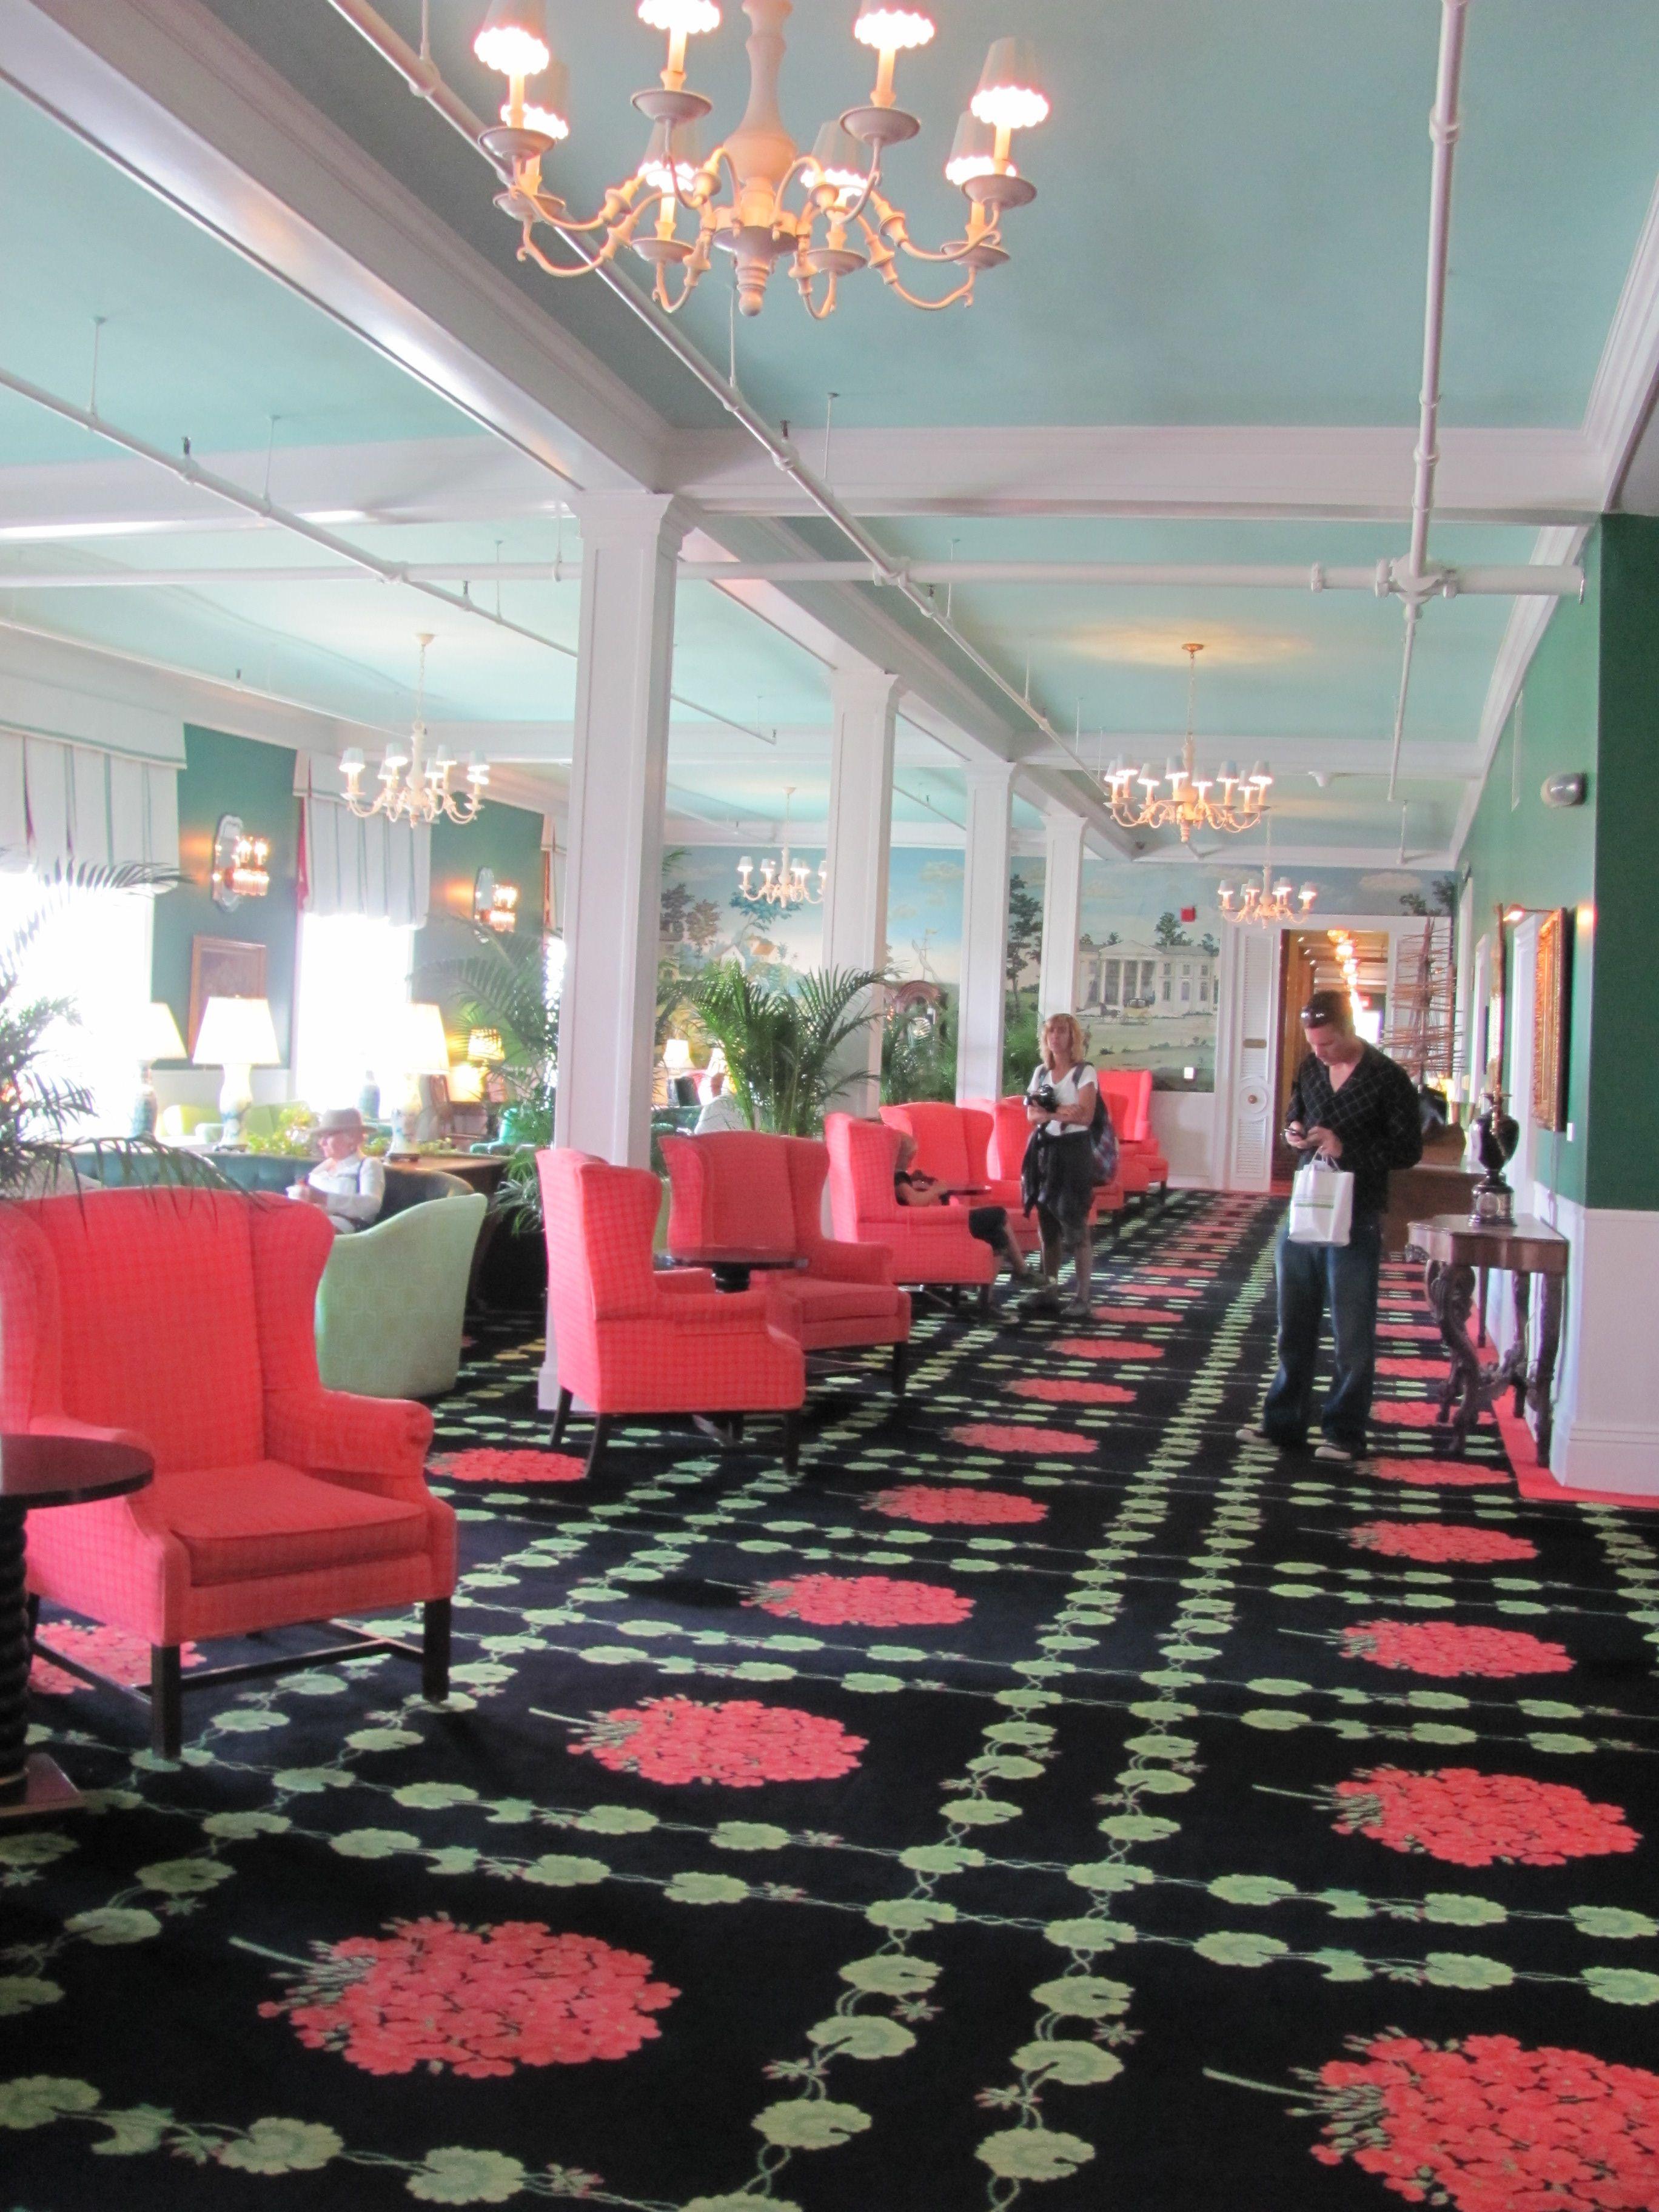 Inside The Beautiful Grand Hotel.